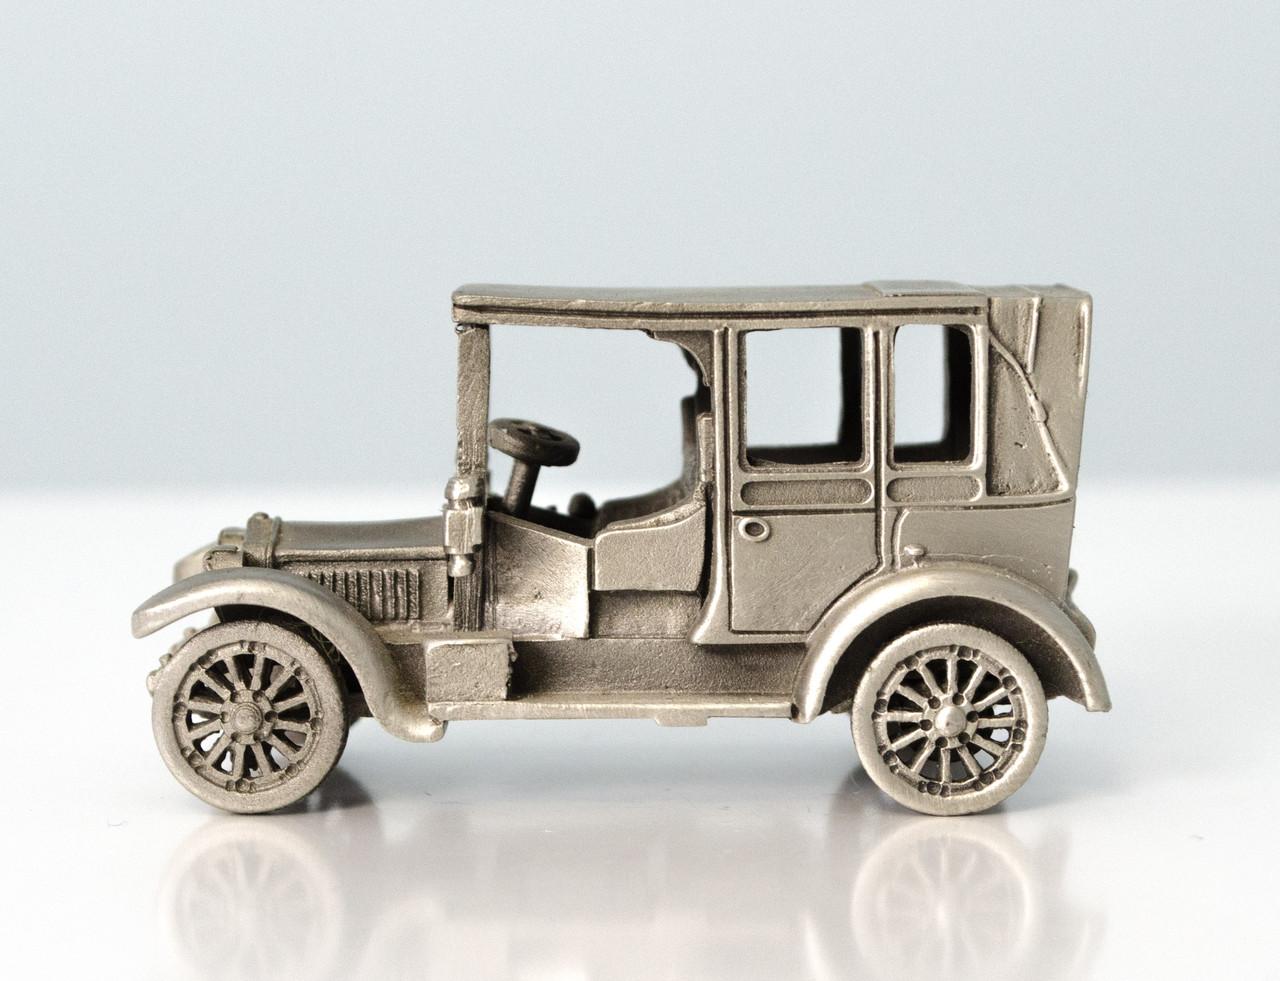 Модель автомобиля Minerva 1935, миниатюра, олово, Franklin Mint, Малайзия